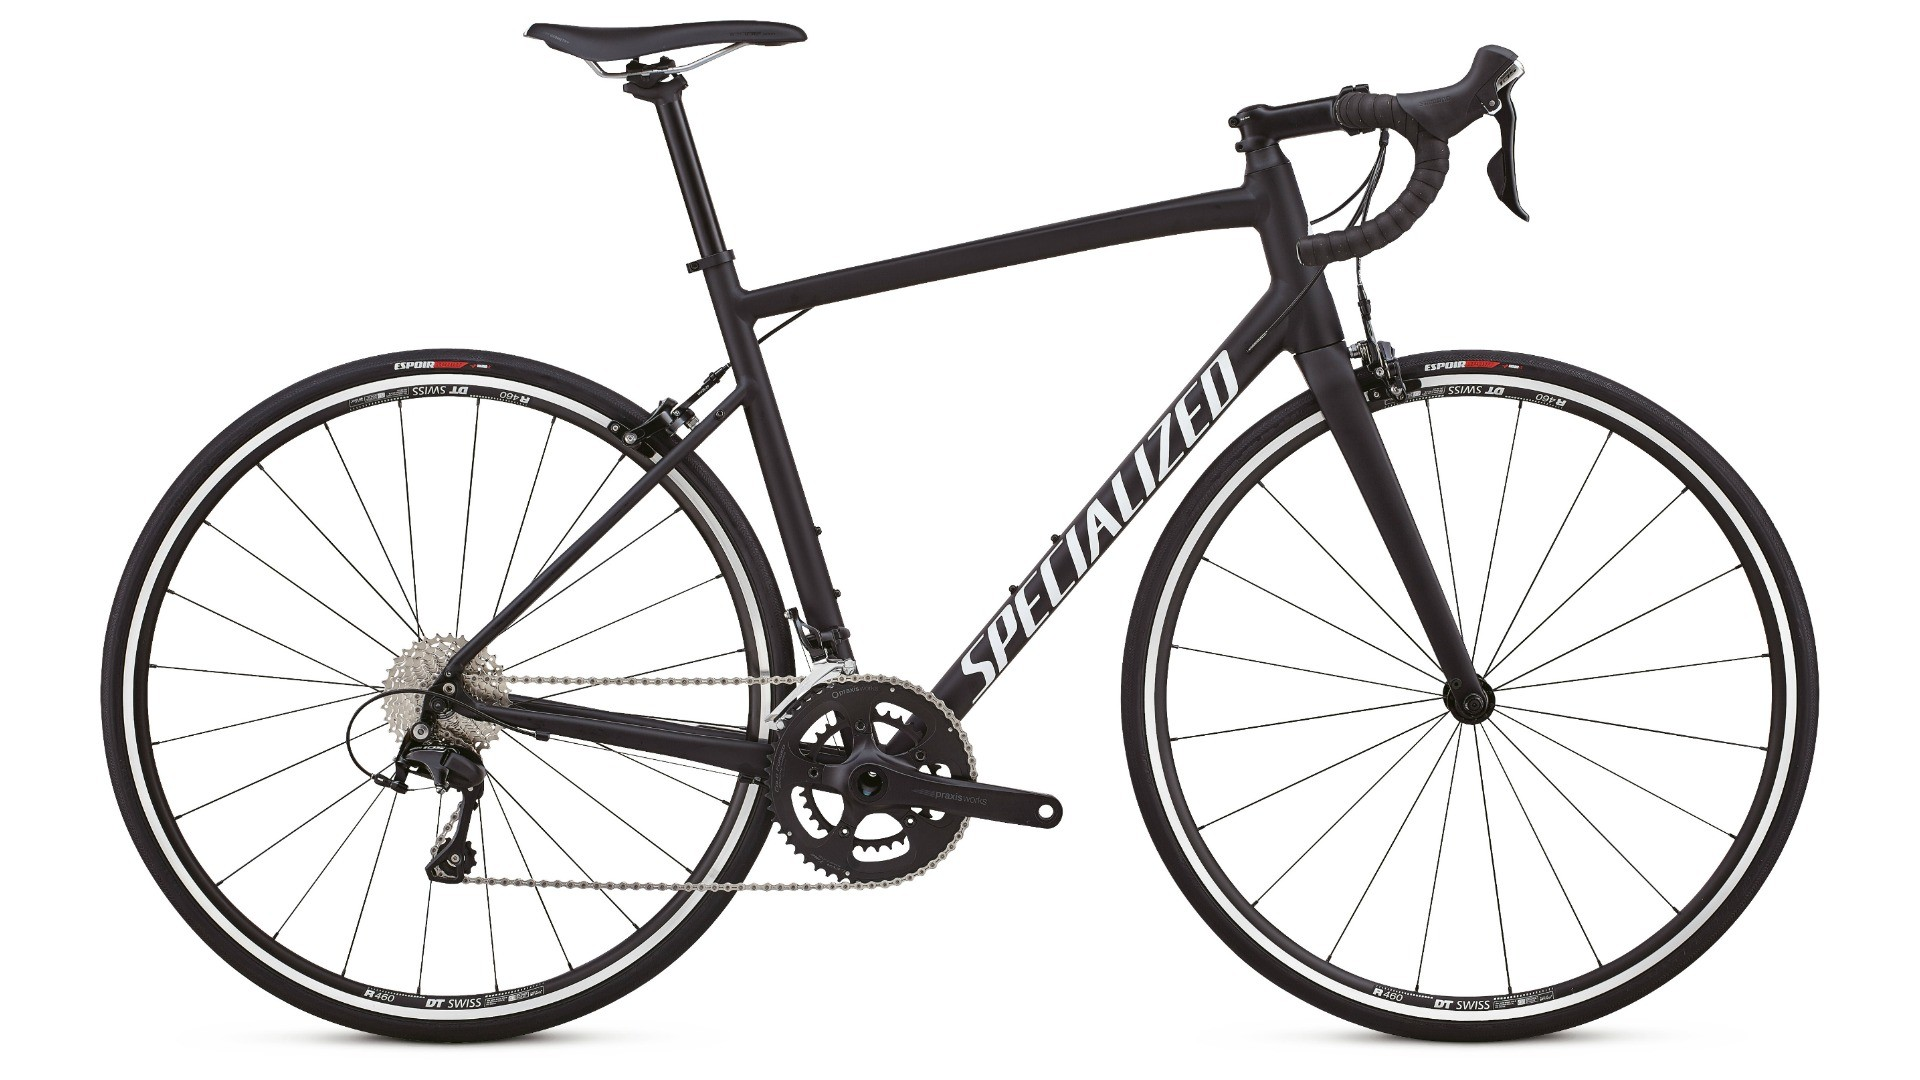 specialized_allez_elite_roadbike-1497505567728-14ilpewoinzgq-ec71102